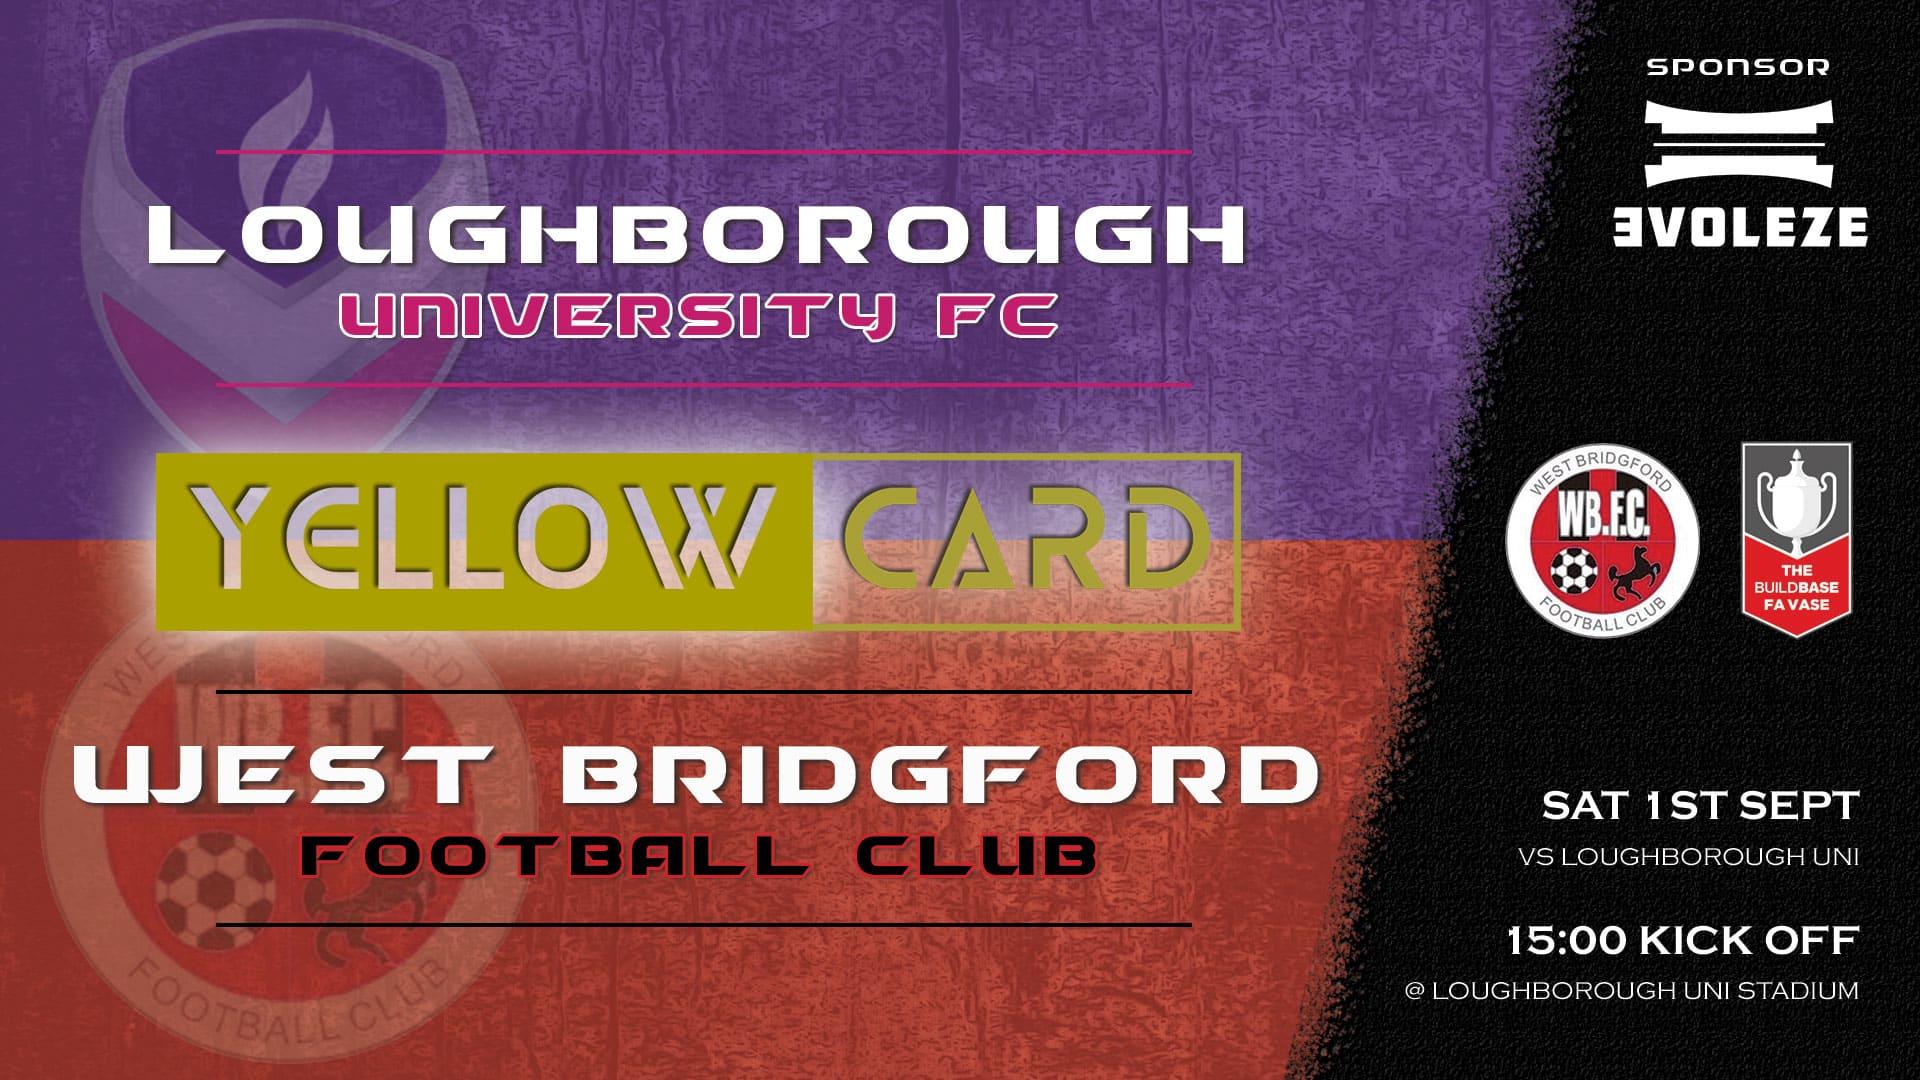 yellow card - West Bridgford FC